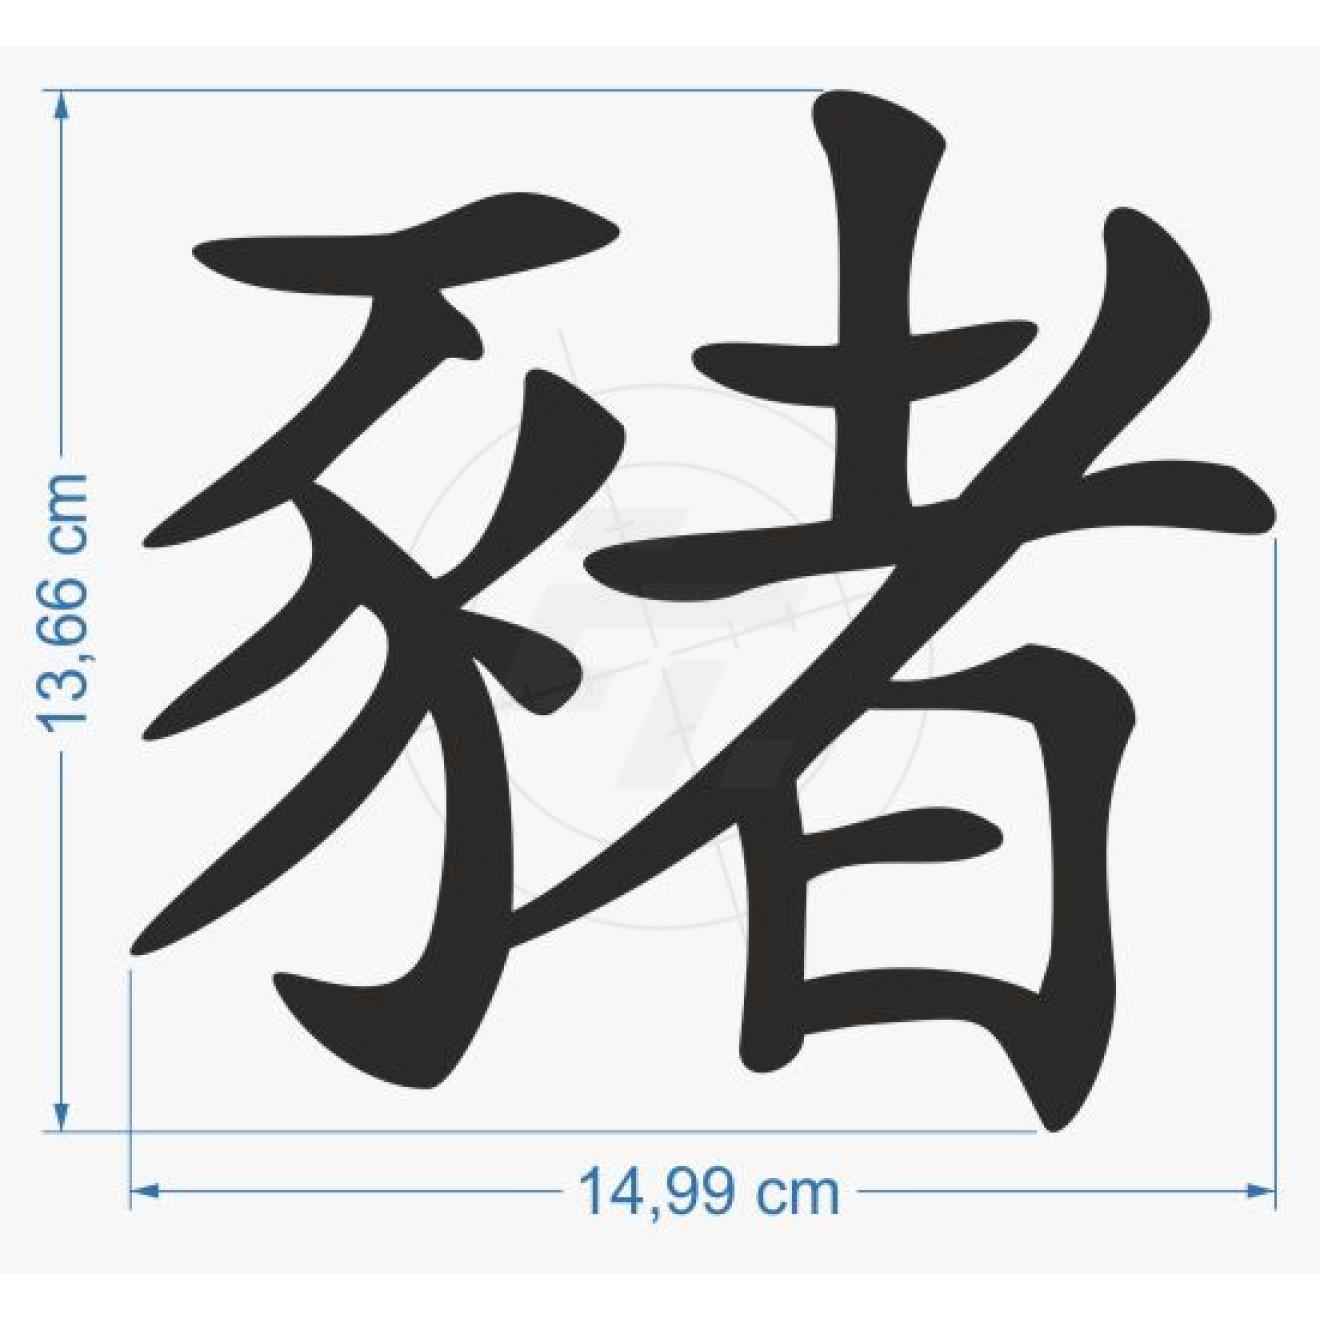 Pig Chinese Horoscope Zodiac Signs